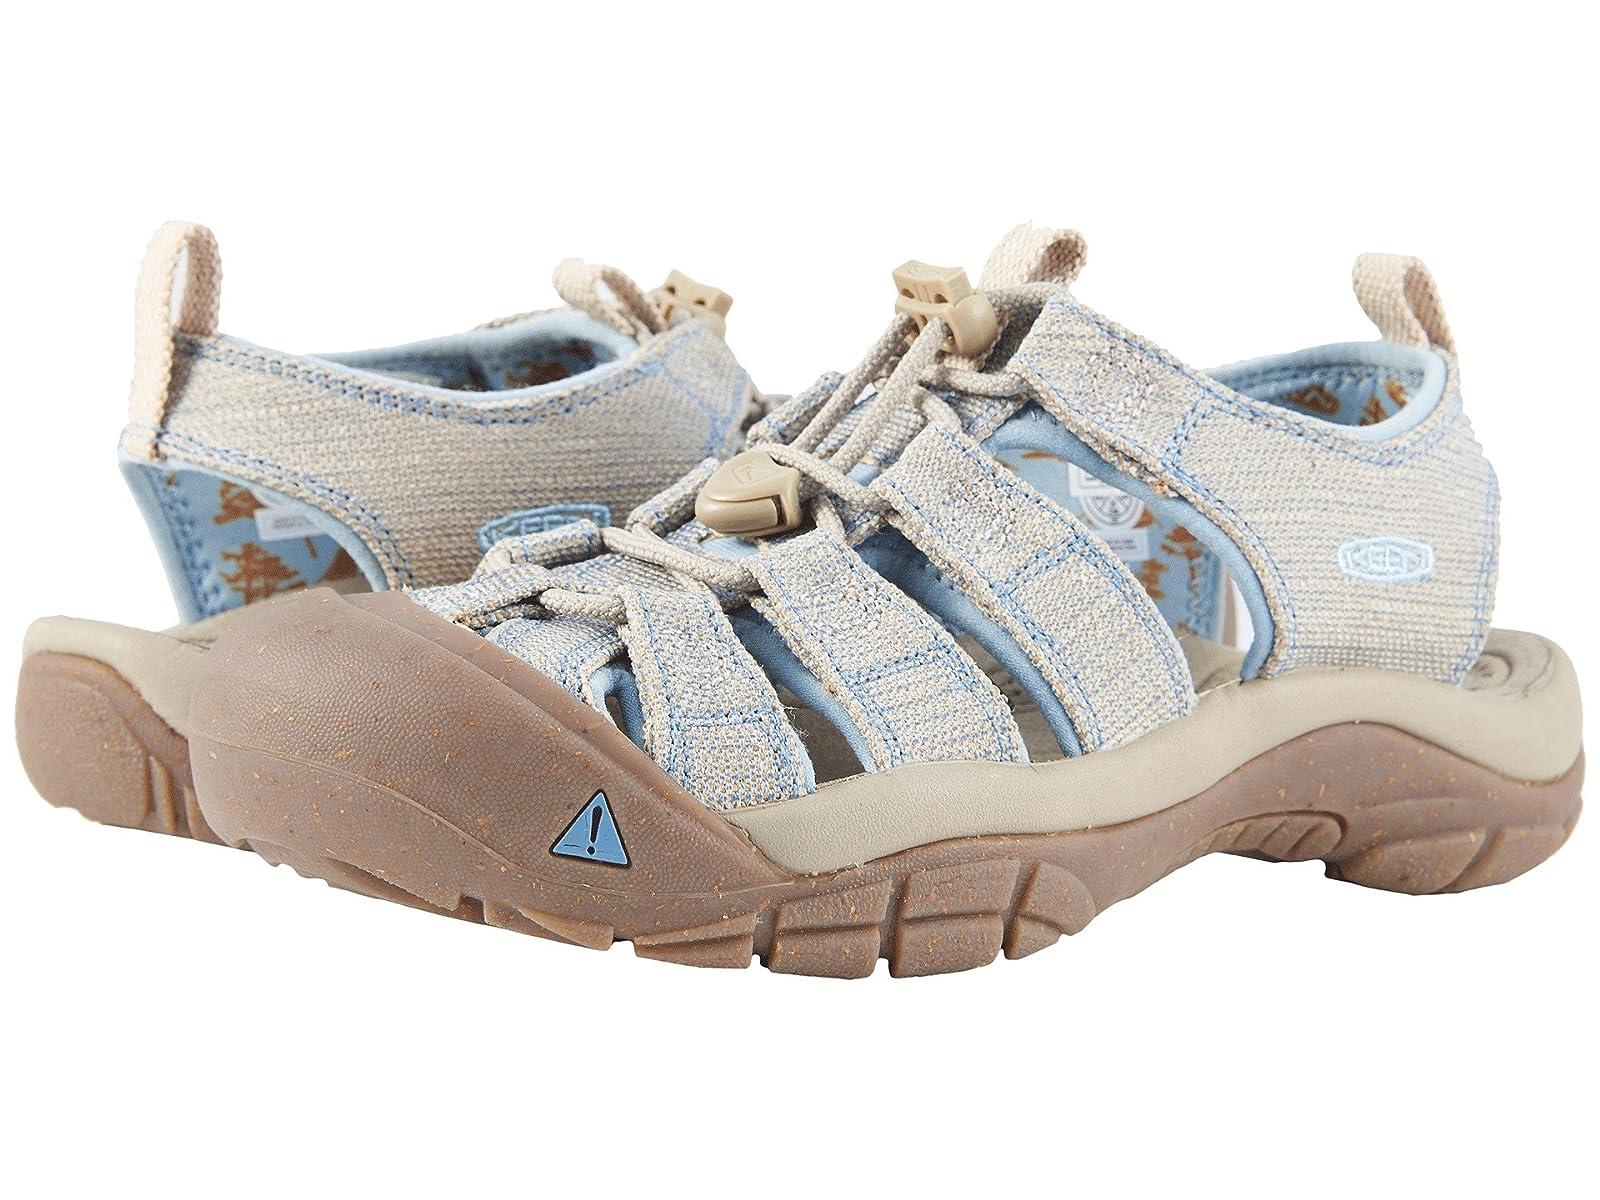 Keen Newport RetroAtmospheric grades have affordable shoes